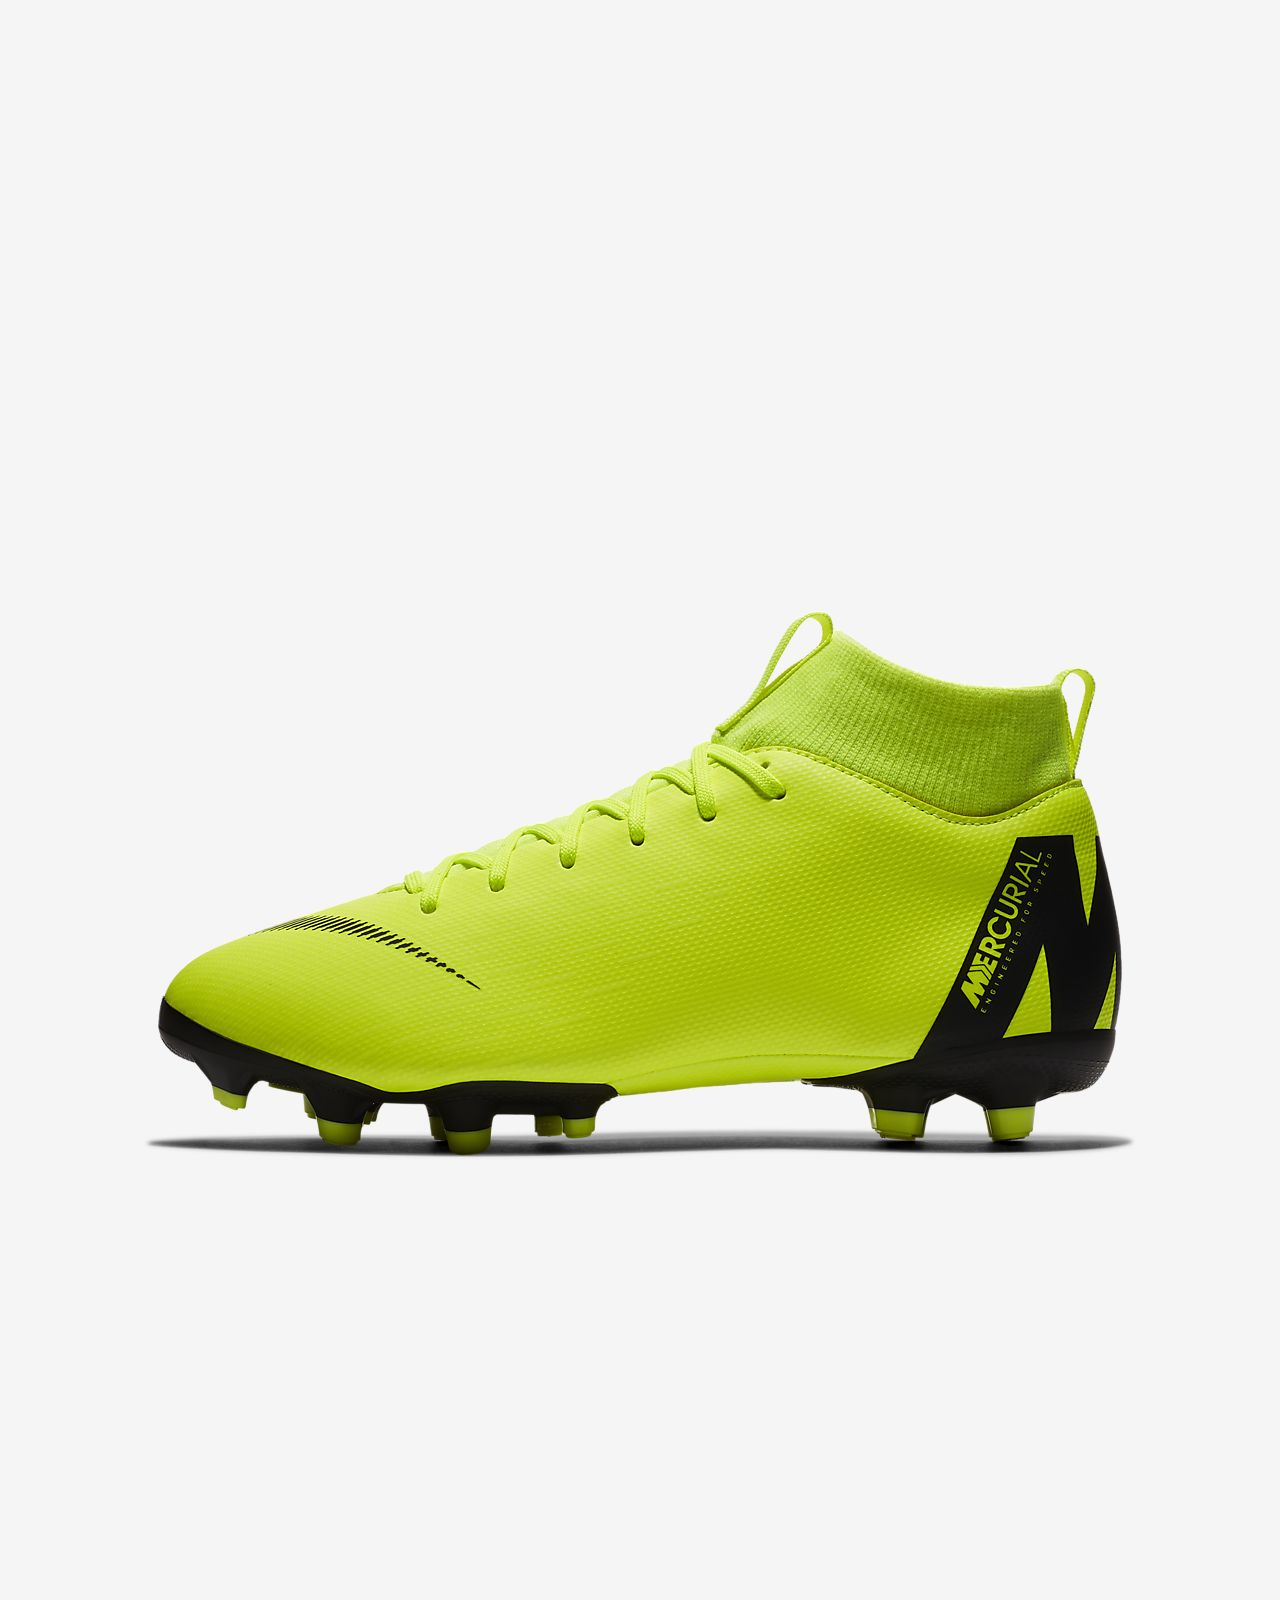 Nike Jr. Superfly 6 Academy MG Küçük/Genç Çocuk Çoklu Zemin Kramponu